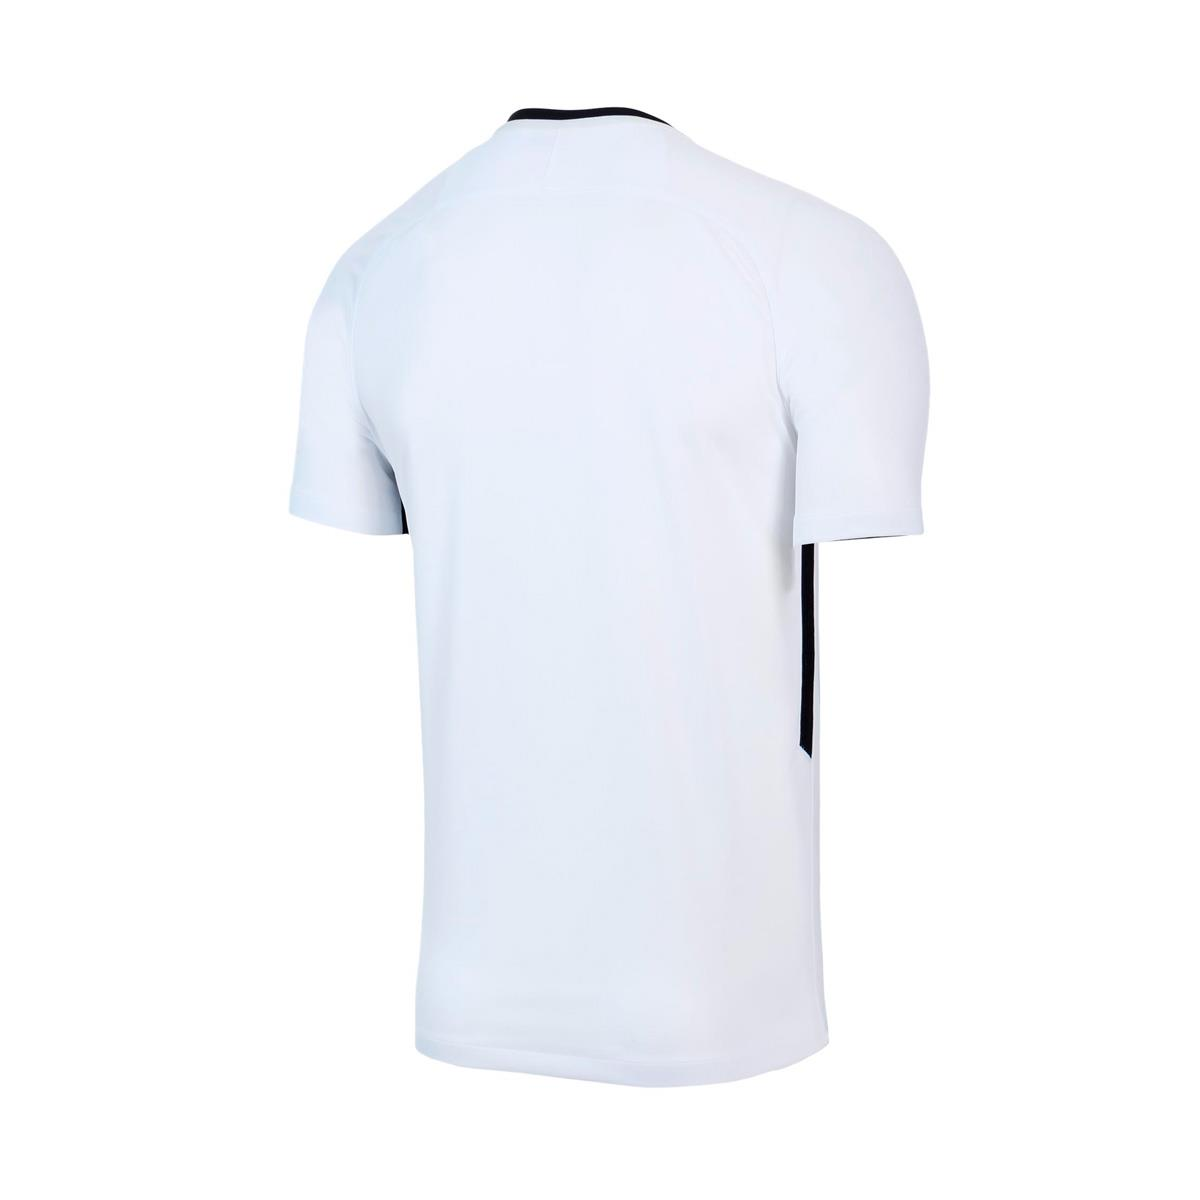 9c76222ad2 Camisa Nike Corinthians I 2017 2018 Torcedor Masculina